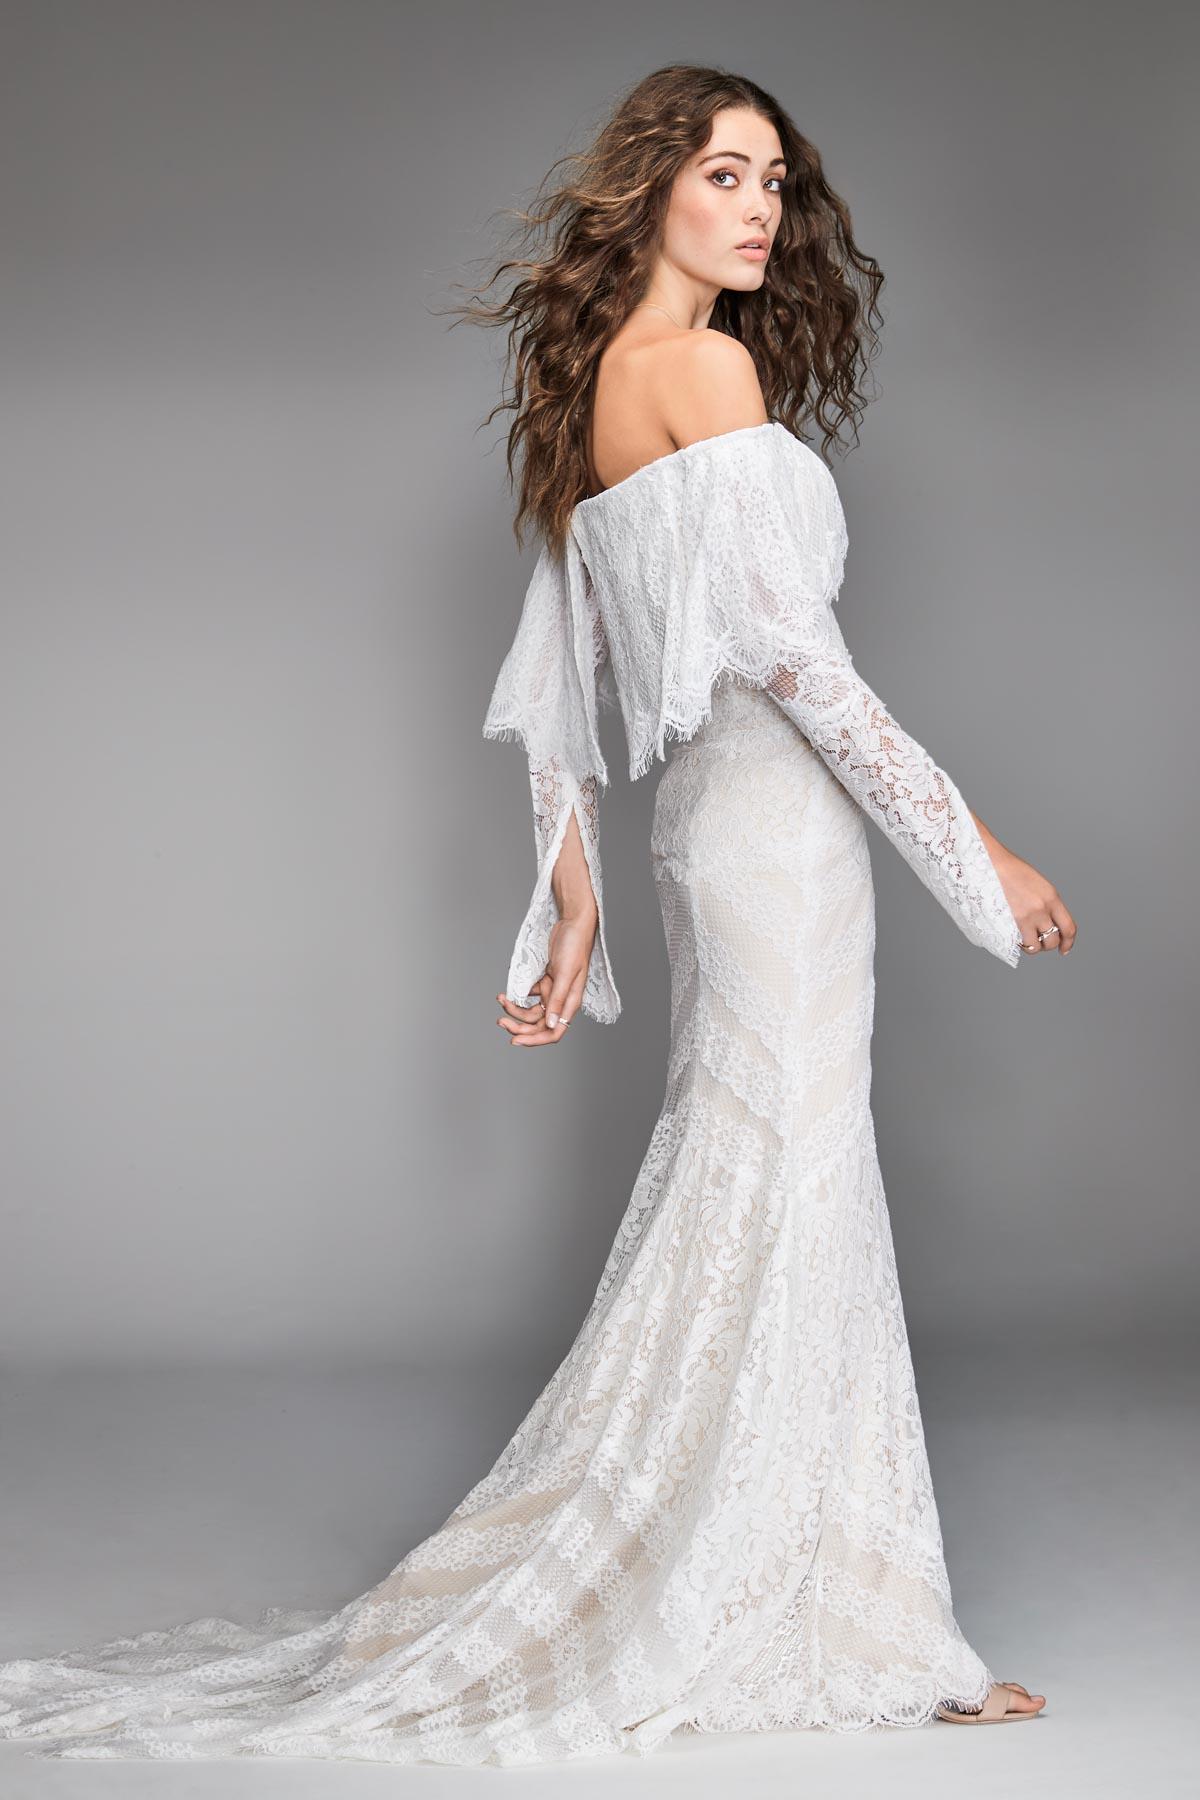 Off-Shoulder Lace Sheath Bridal Dress | Bycouturier